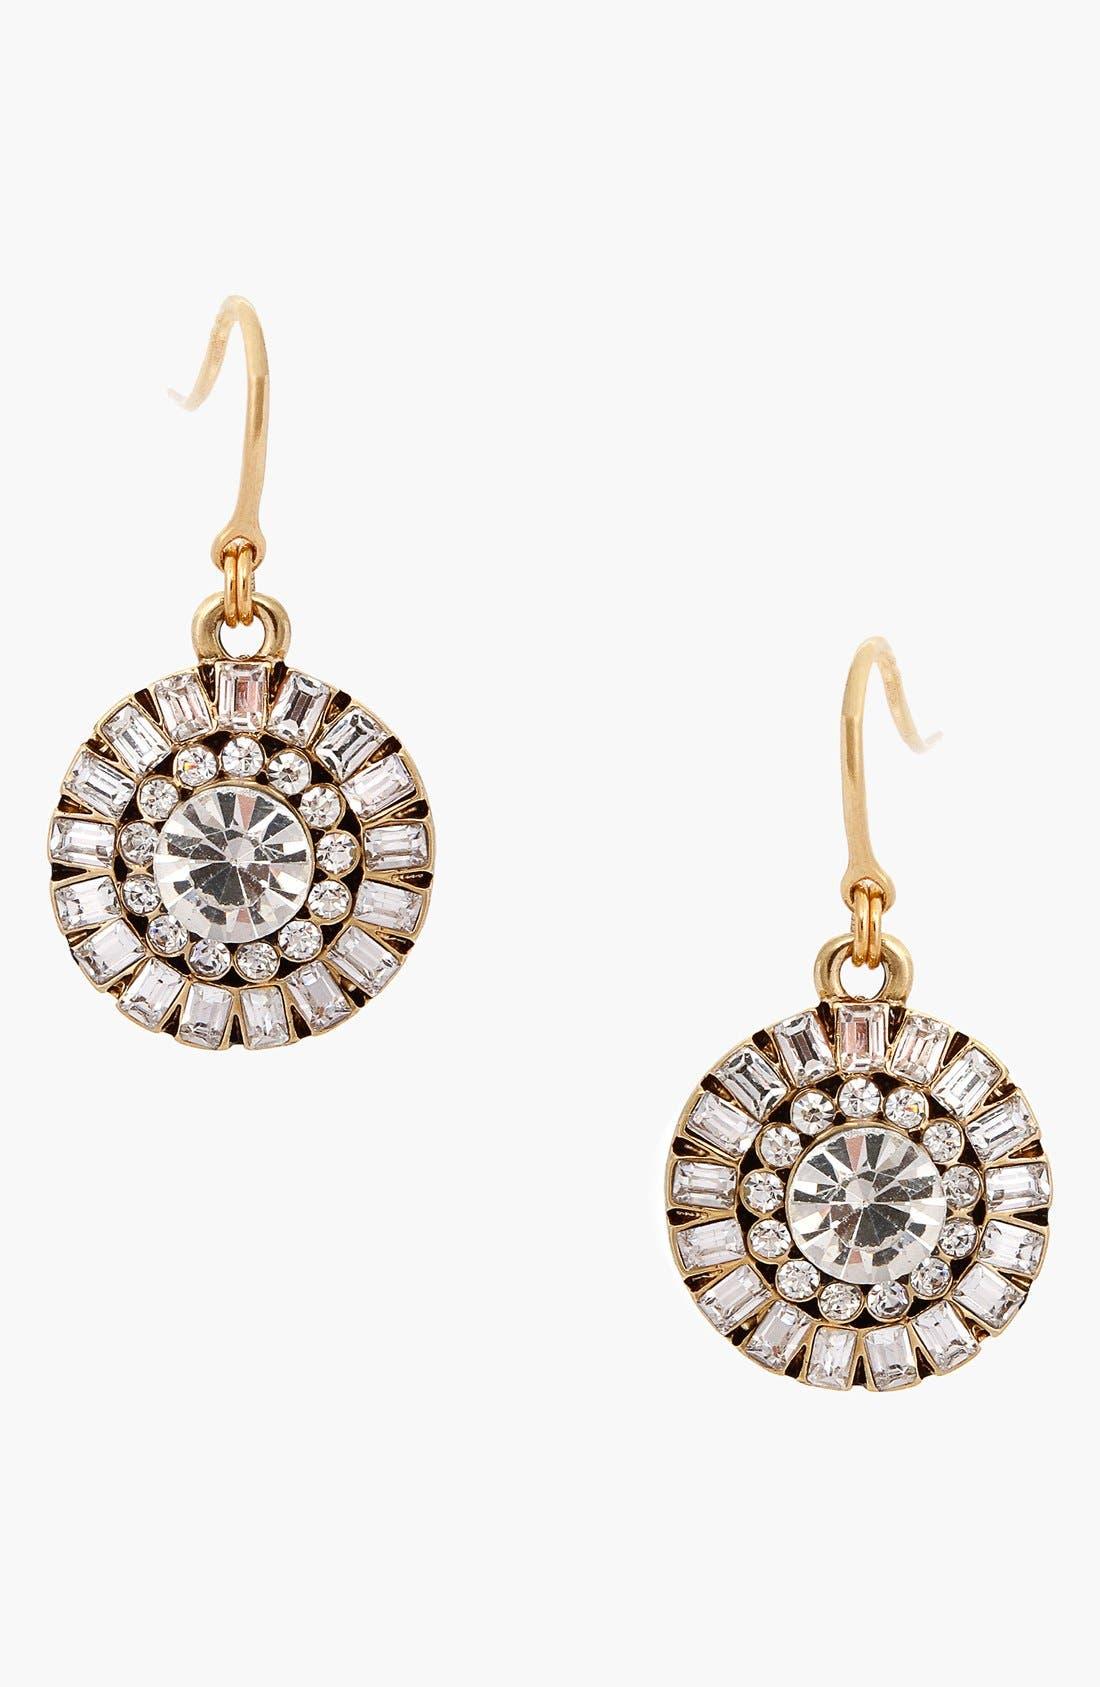 Alternate Image 1 Selected - Erickson Beamon Rocks 'Heart of Glass' Drop Earrings